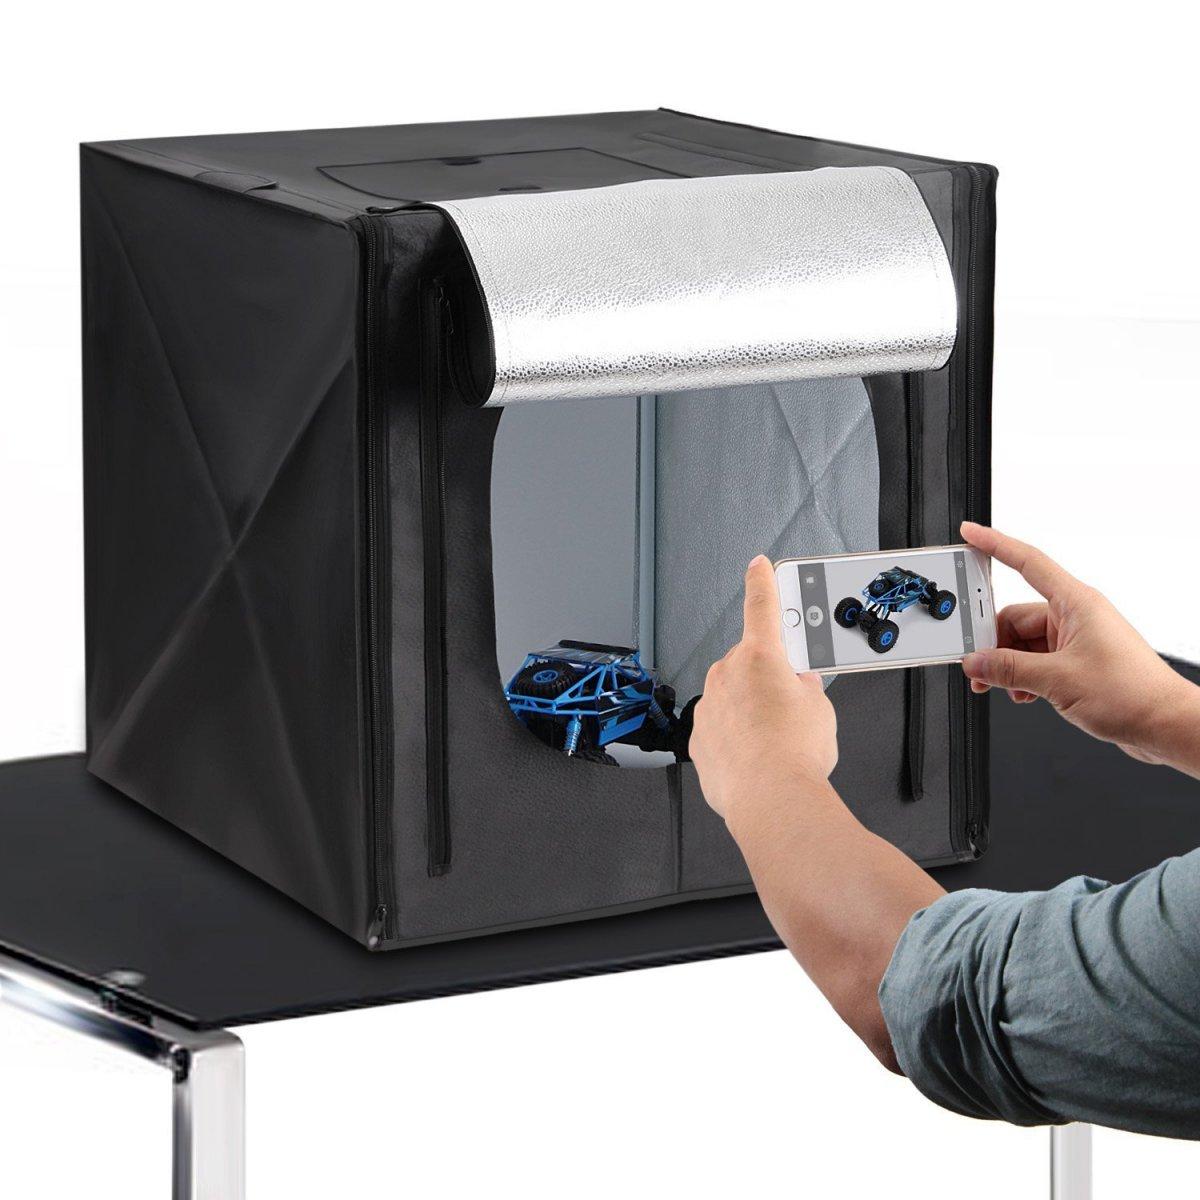 Portable Photography Studio: The Light Box